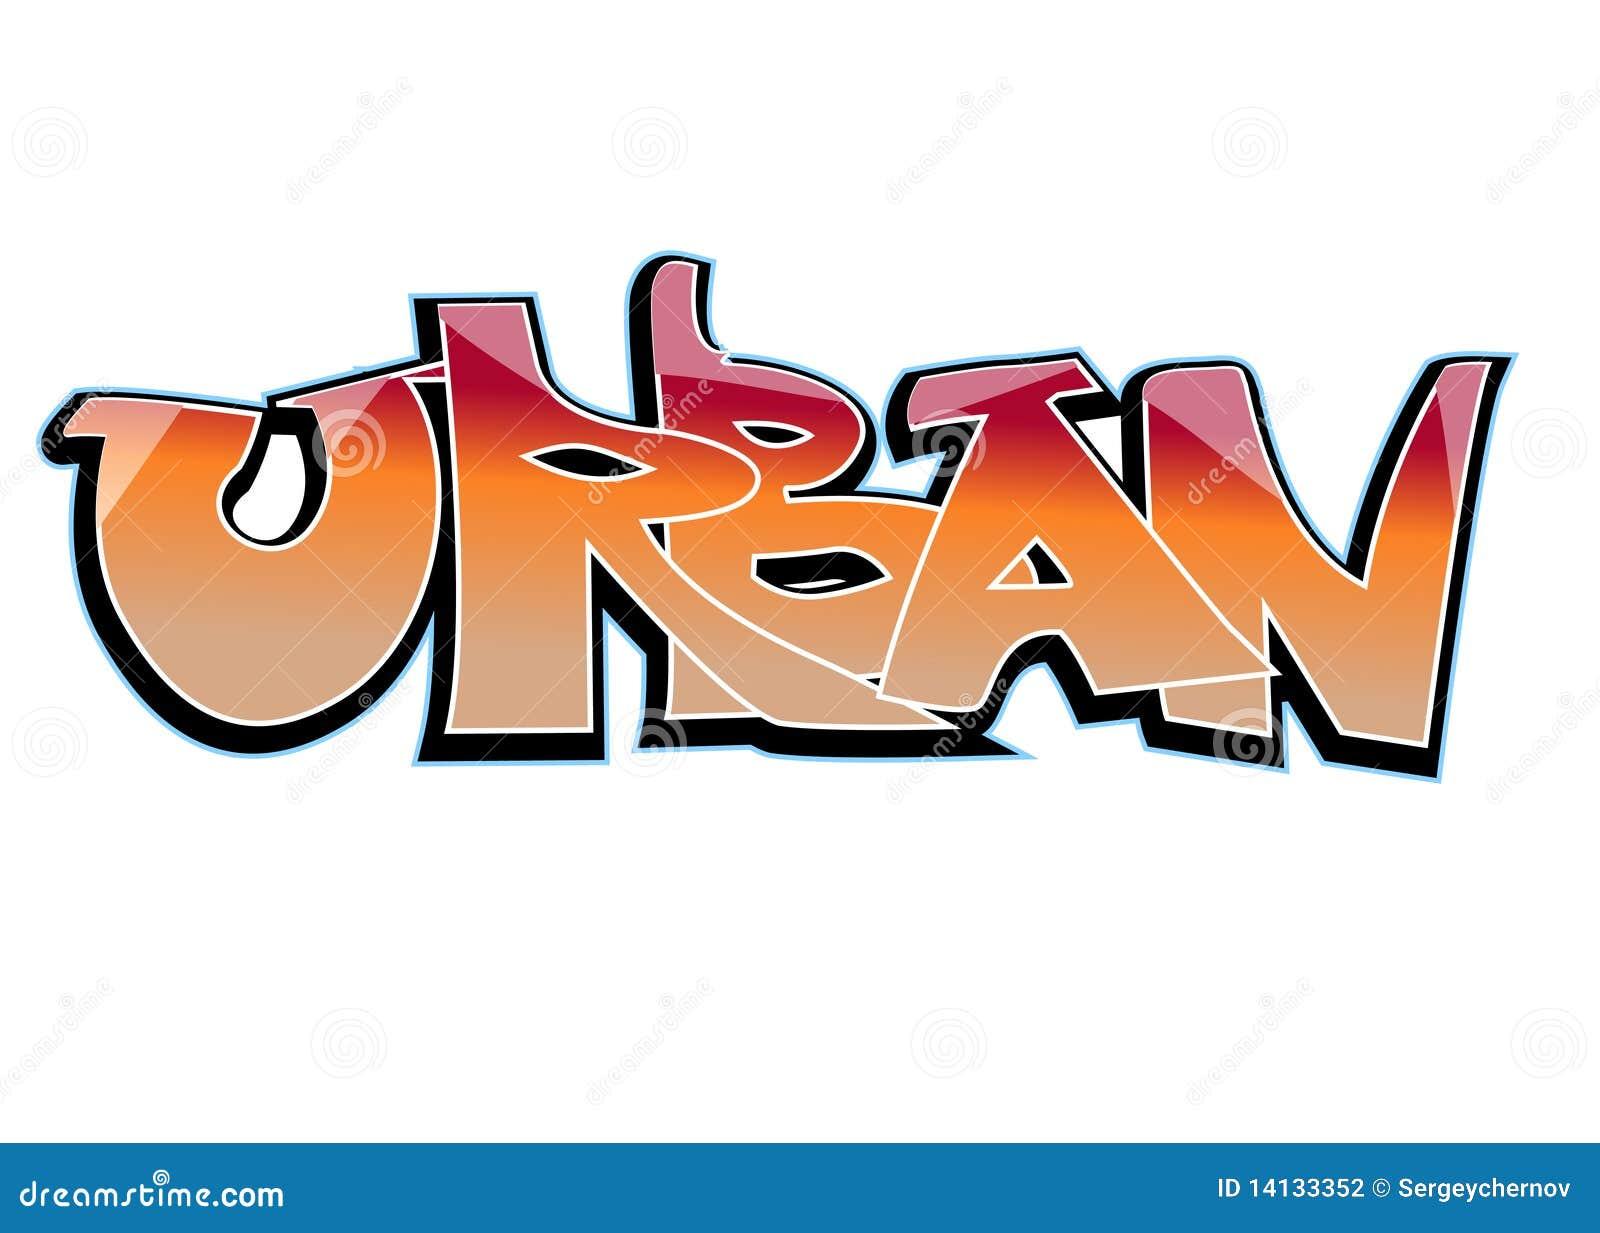 Graffiti art design - Art Design Graffiti Illustration